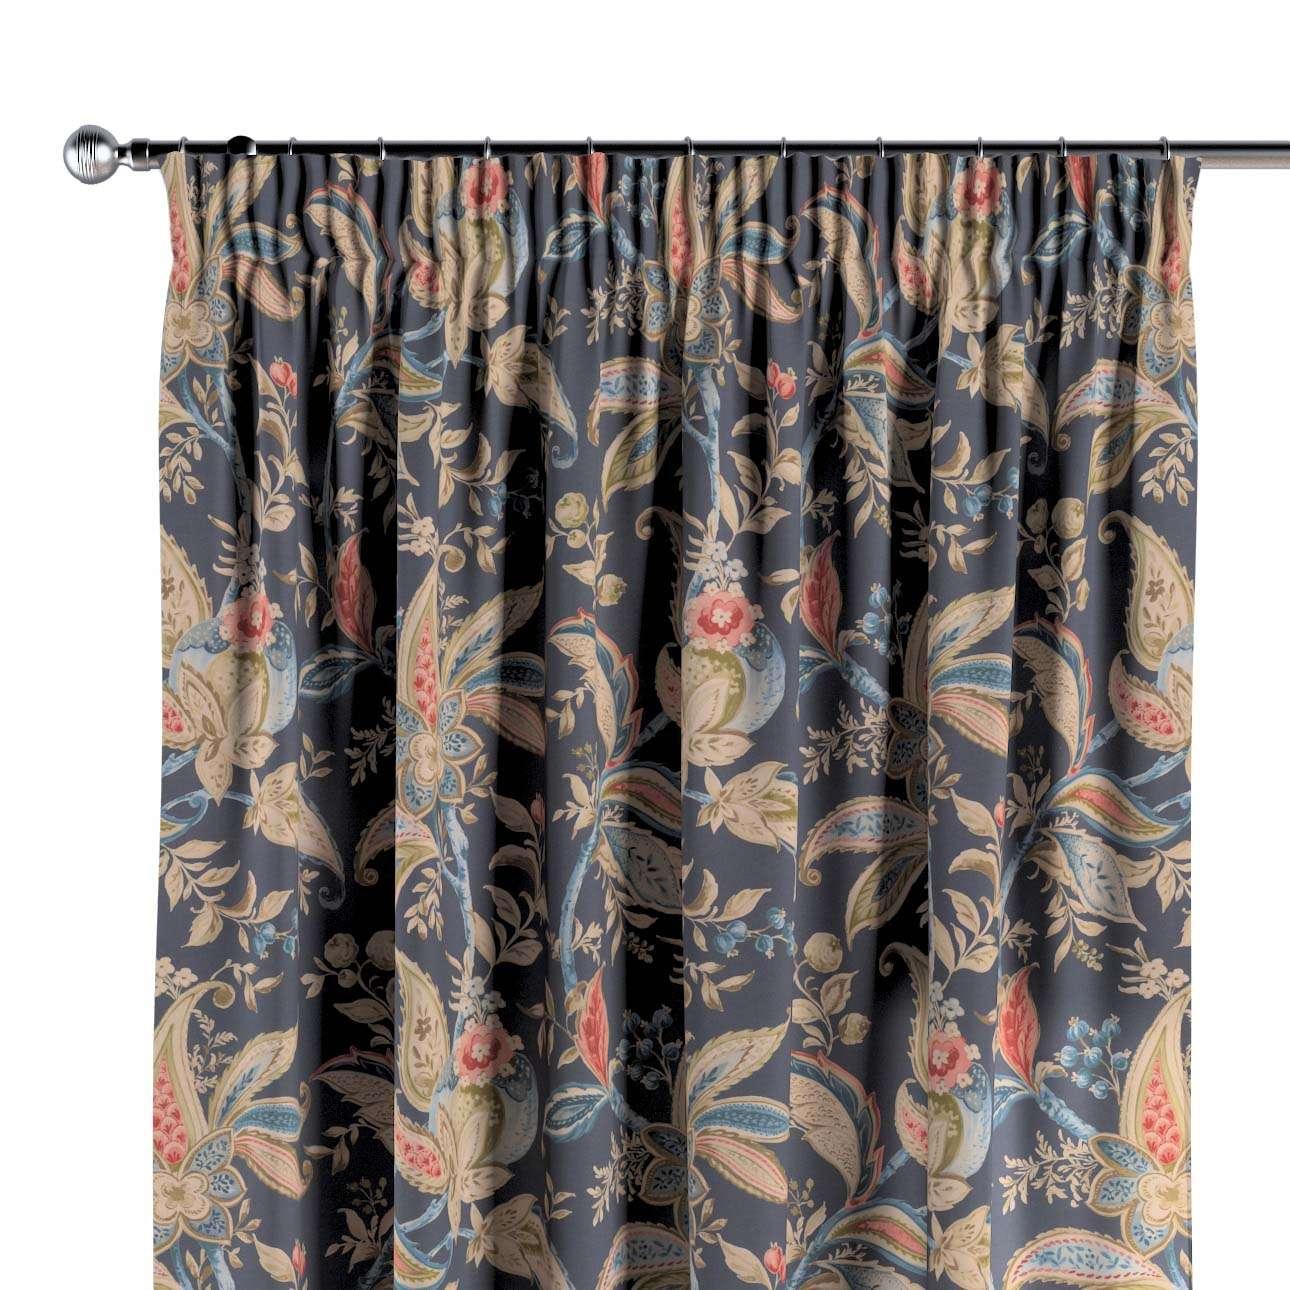 Pencil pleat curtain in collection Gardenia, fabric: 142-19